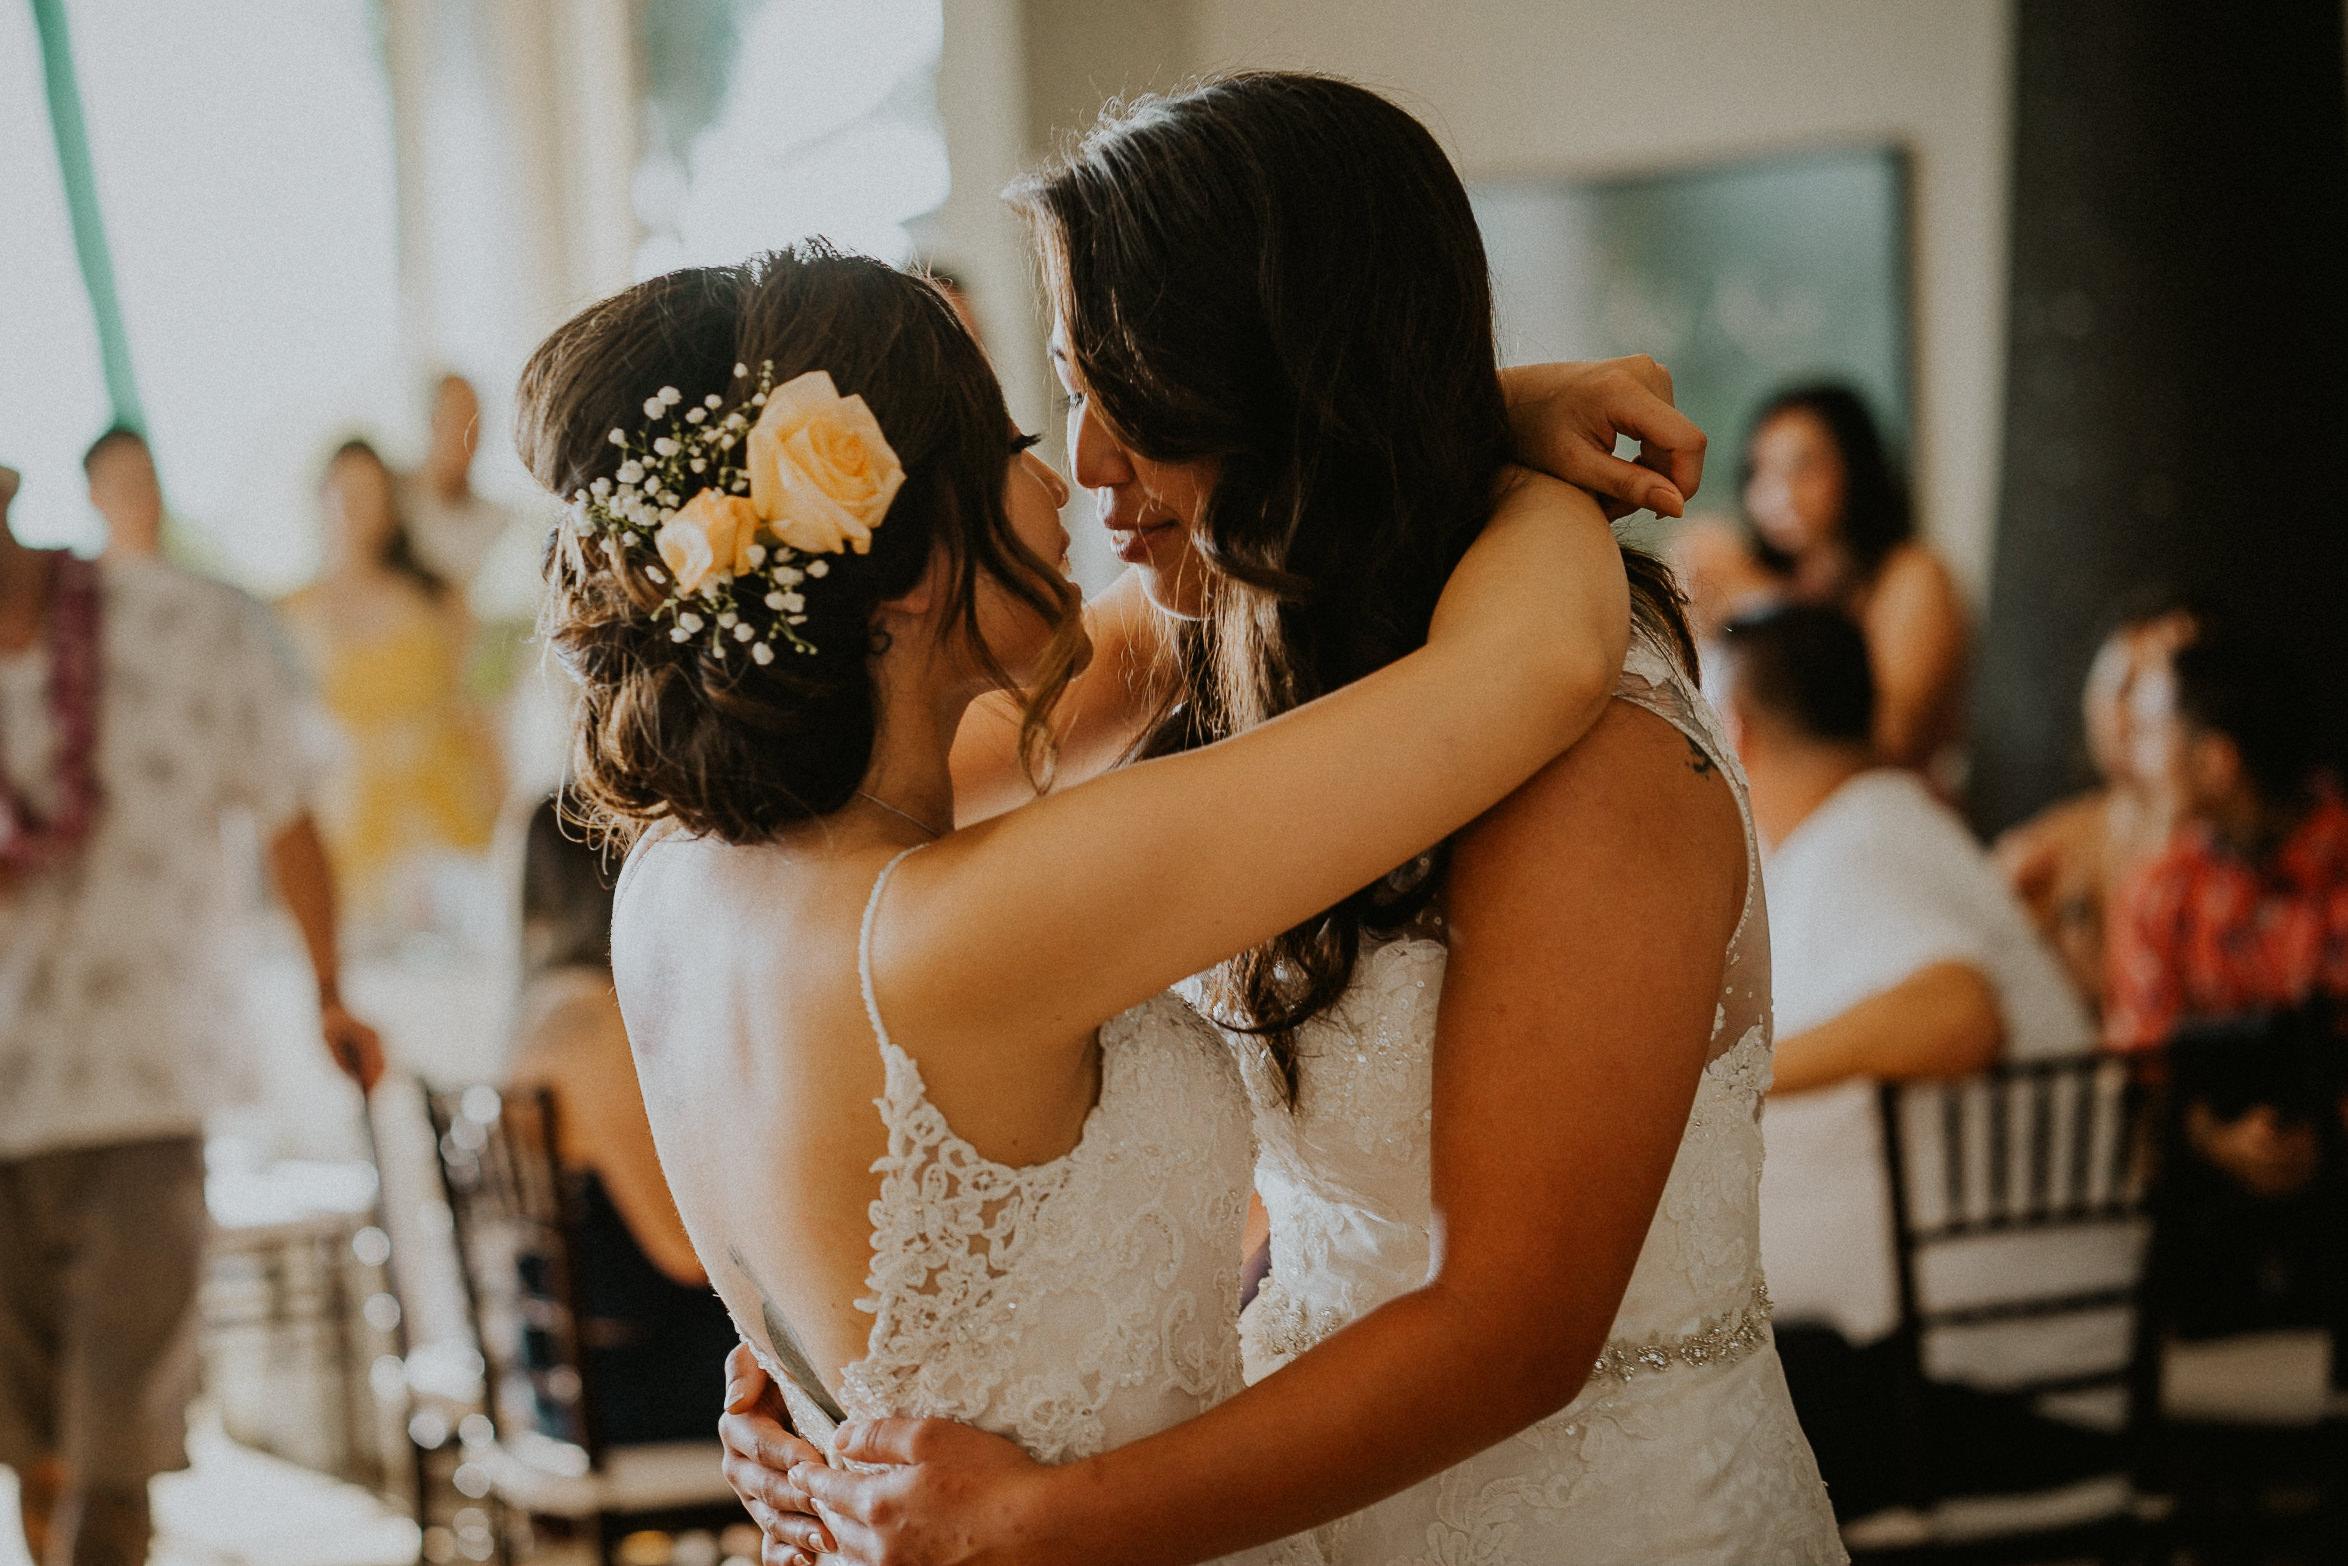 Maui_Destination_wedding_Alfred_Tang-44.jpg